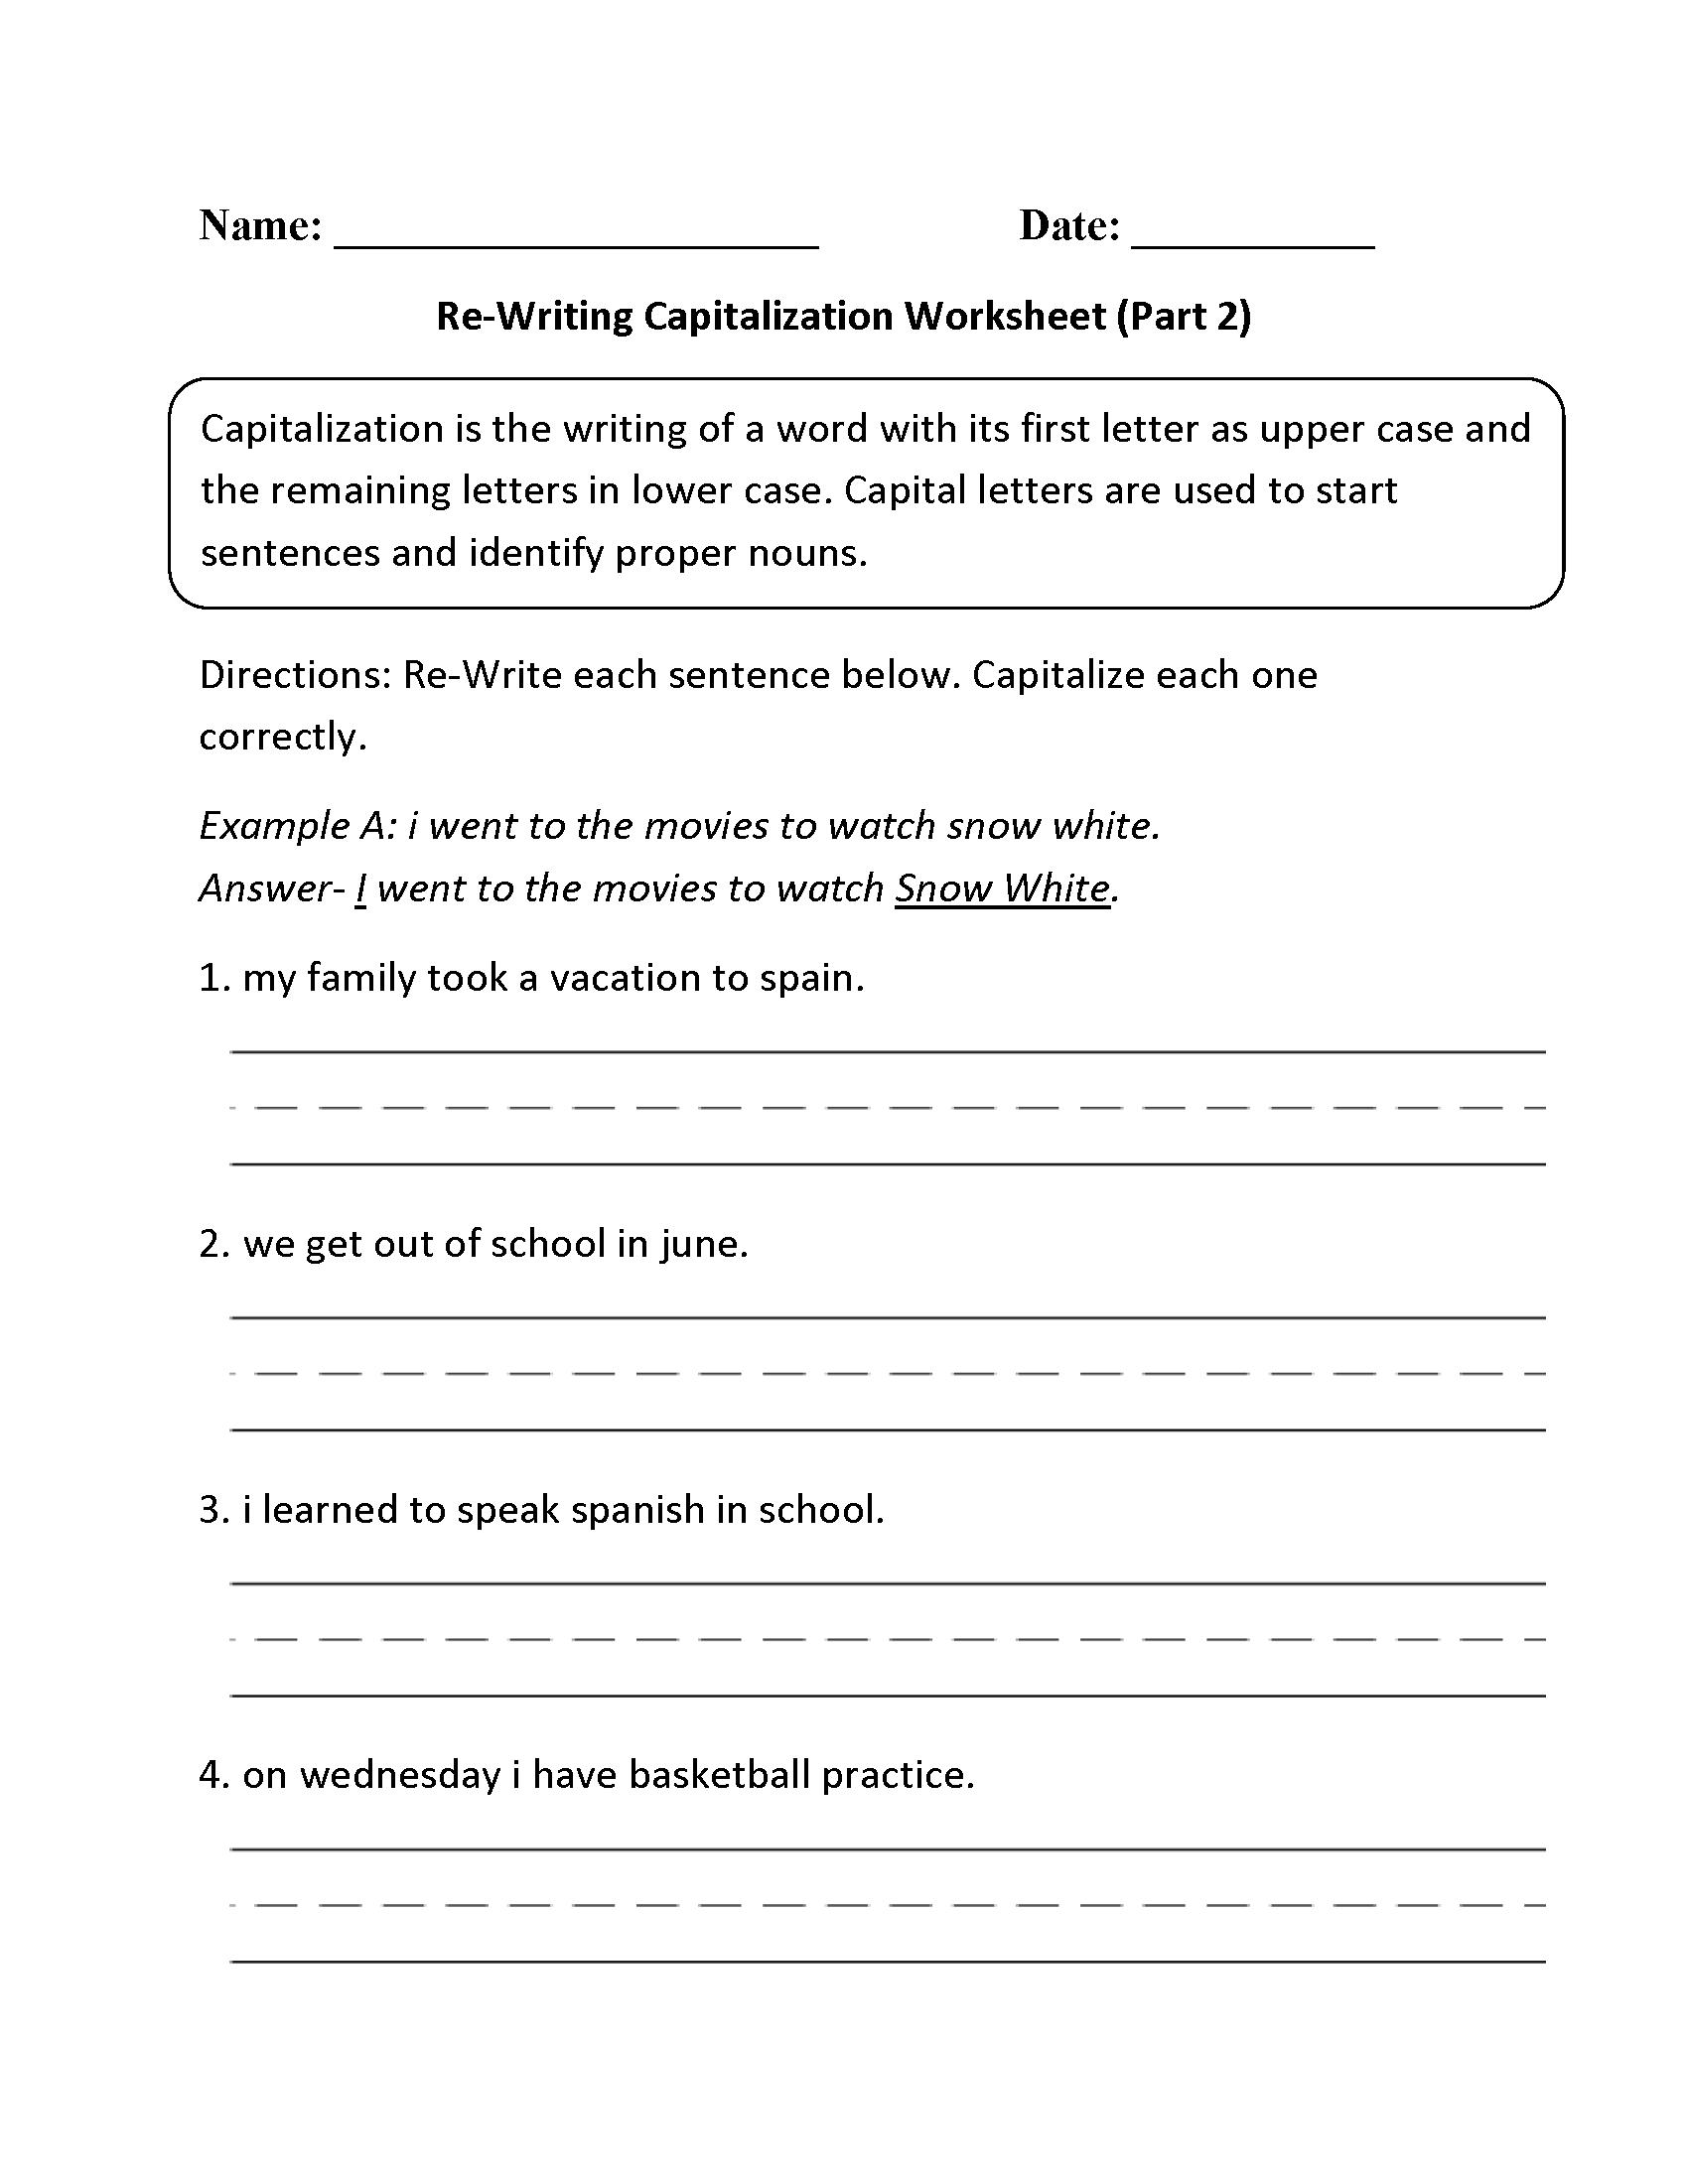 Englishlinx | Capitalization Worksheets - Free Printable Worksheets | Free Printable Worksheets For Punctuation And Capitalization